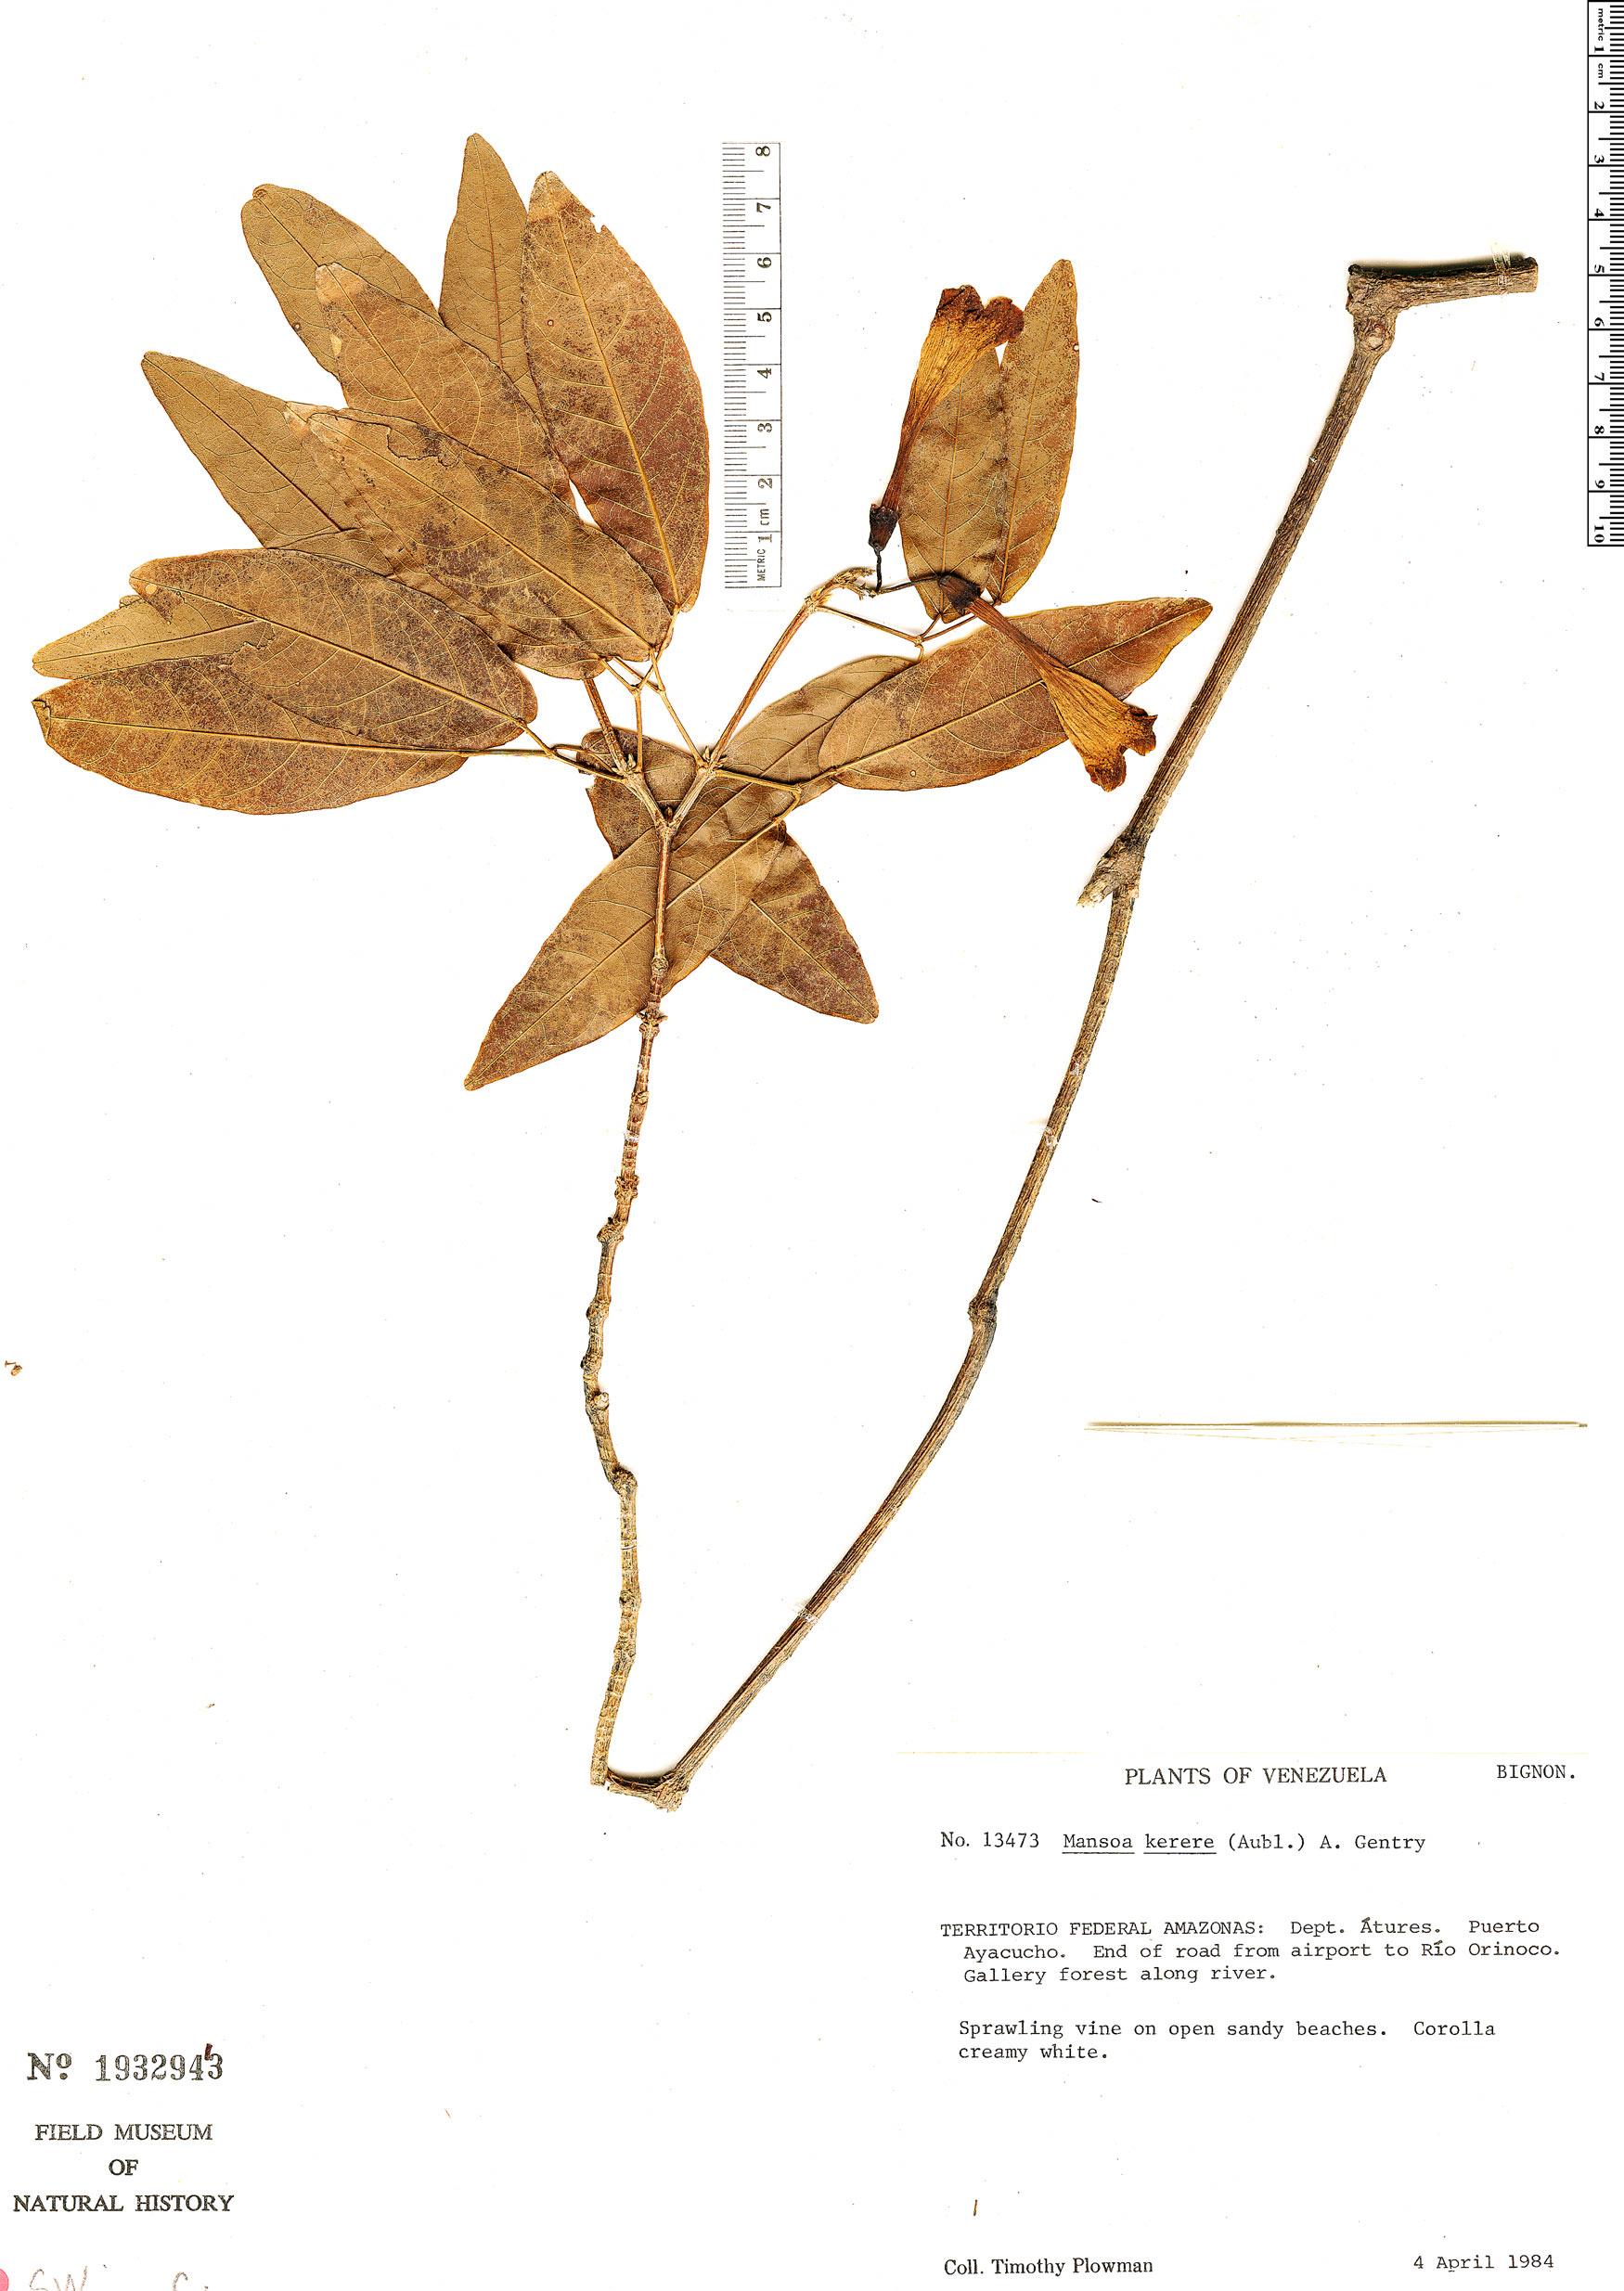 Specimen: Pachyptera kerere